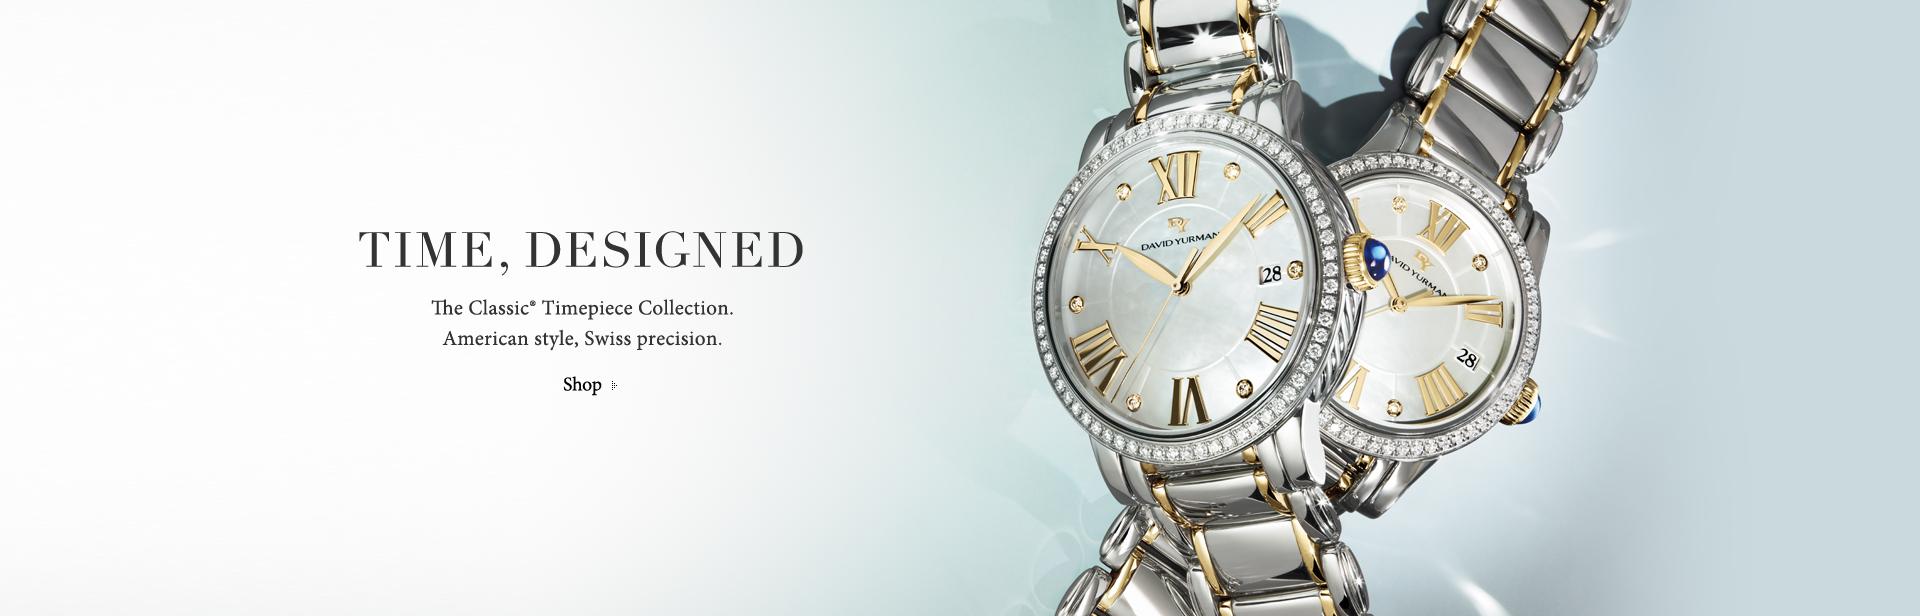 david yurman wedding rings David Yurman Designer Jewelry Bracelets for Women Men Engagement Rings